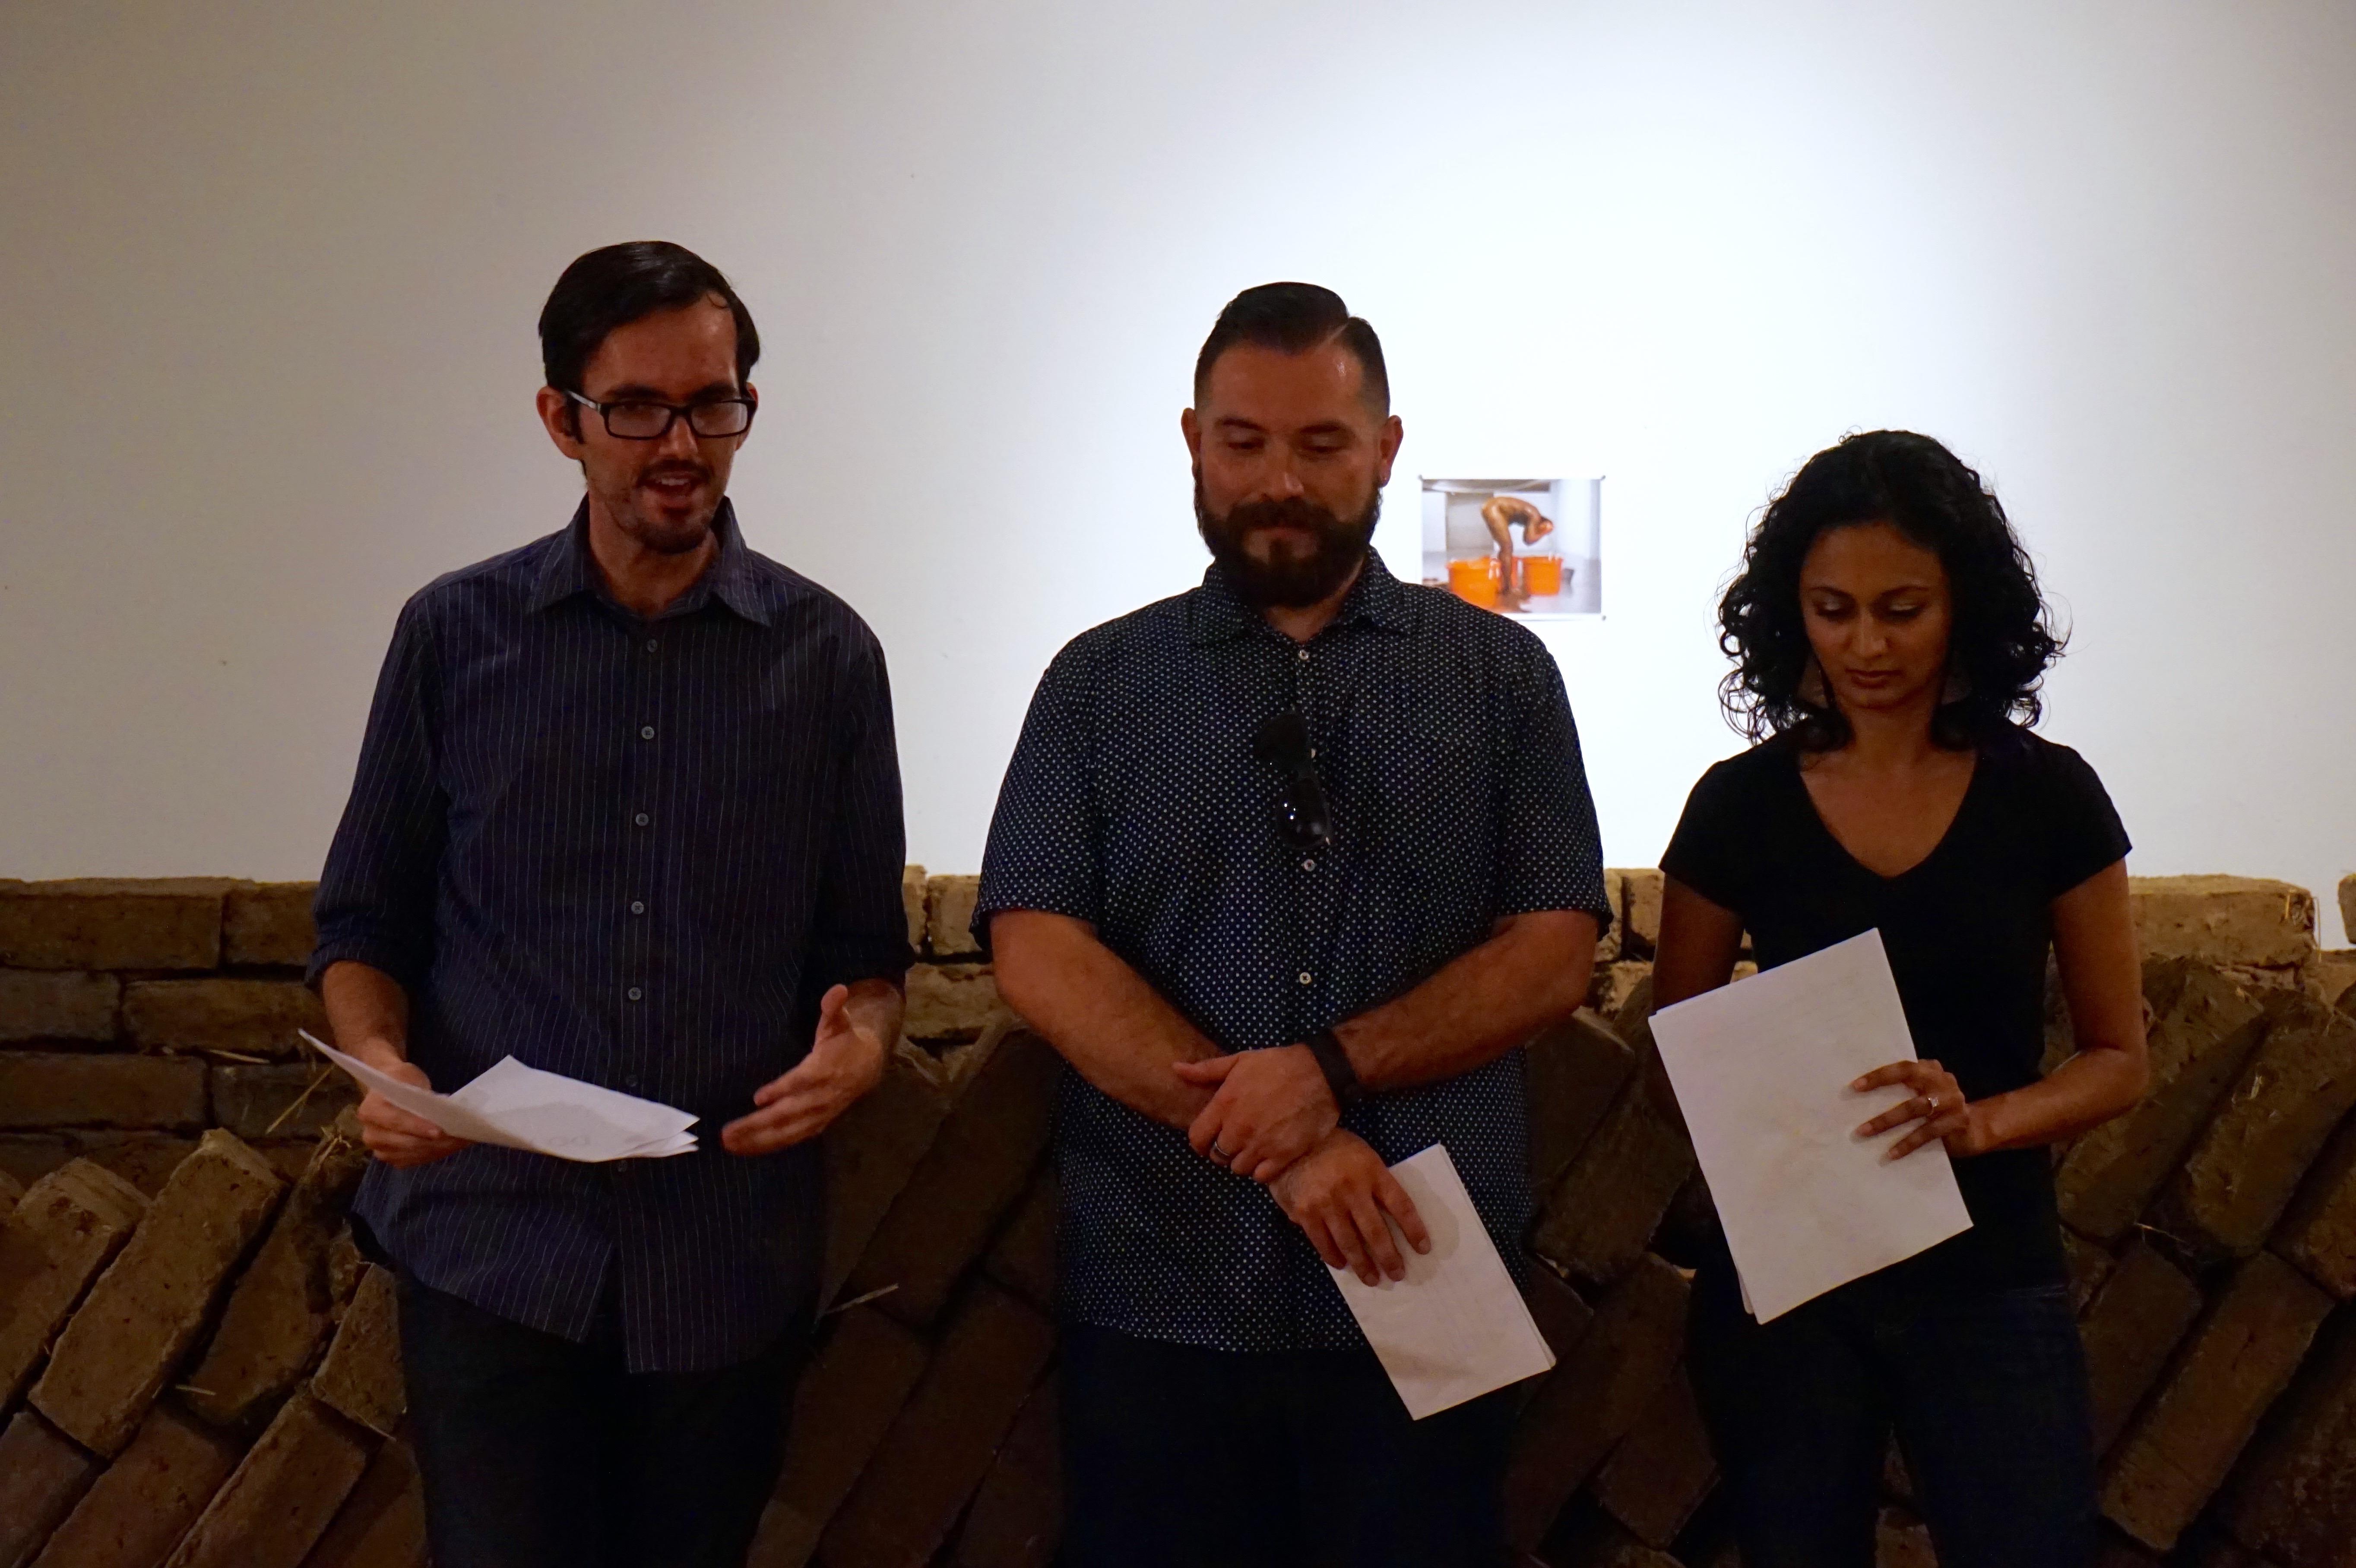 MTT organizers Noé Gaytán, Mario Mesquita, and Shefali Mistry